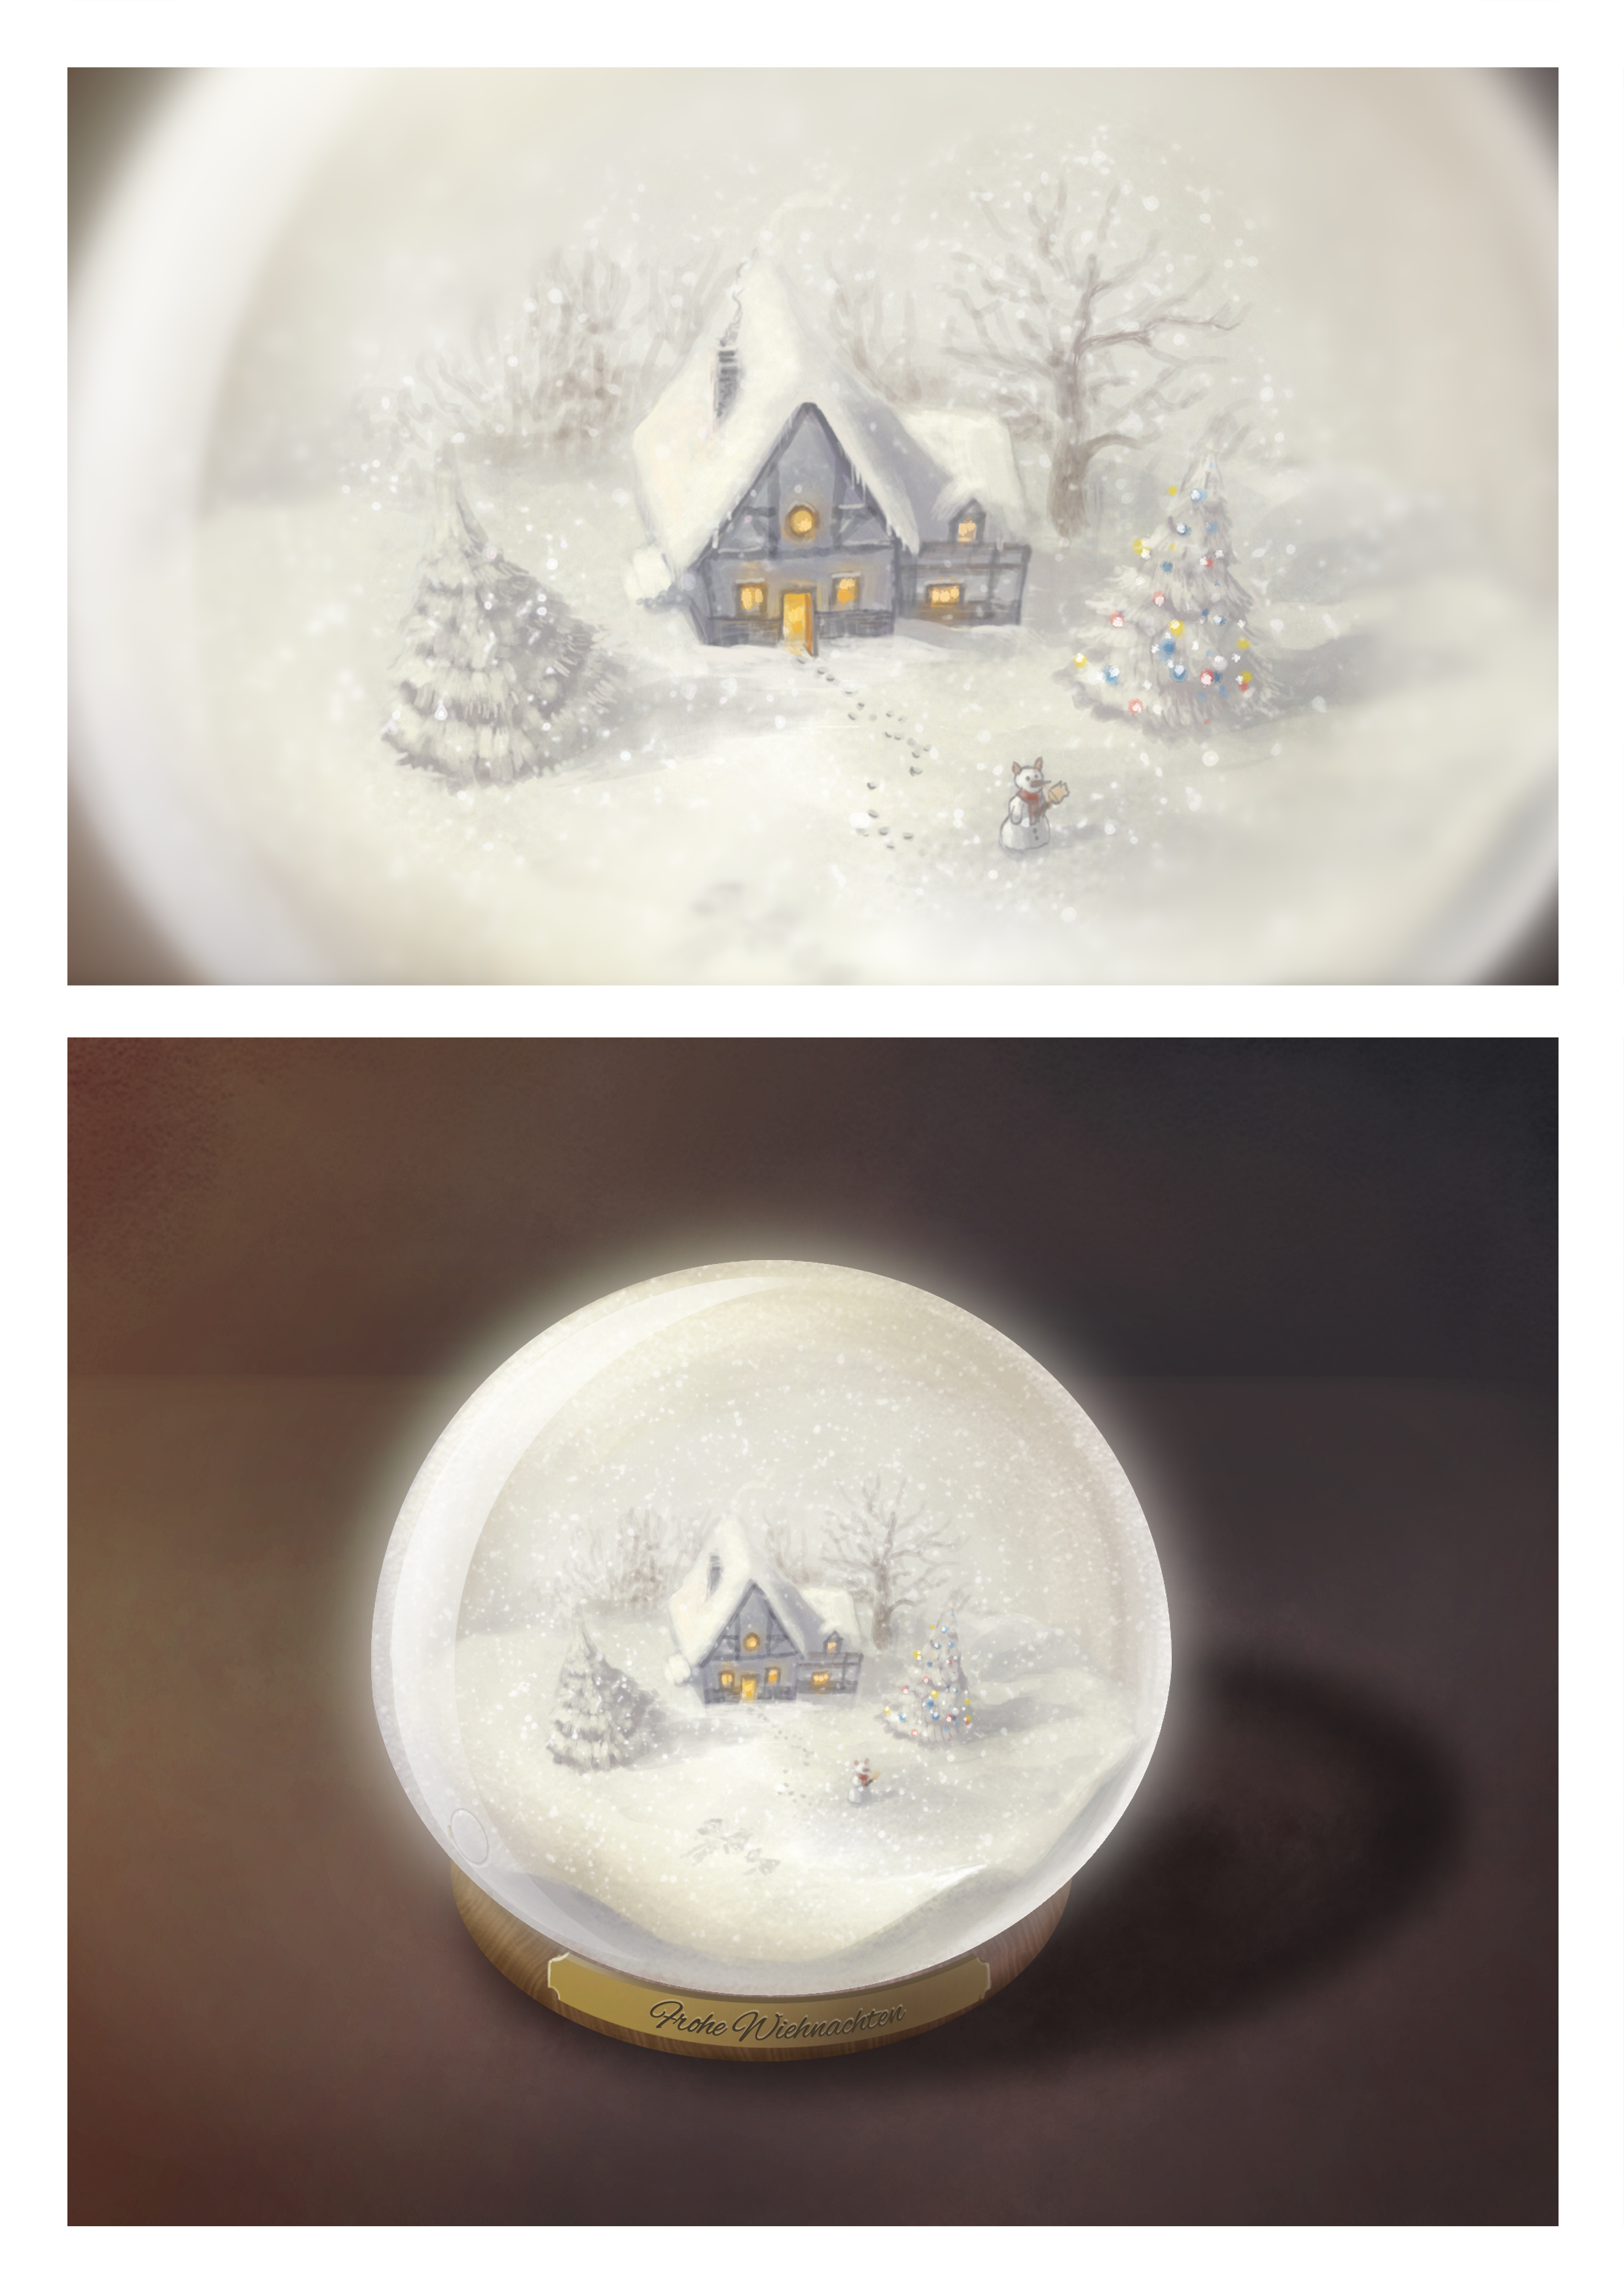 Folg 5: Extra-Folg to Wiehnachten, Page 4